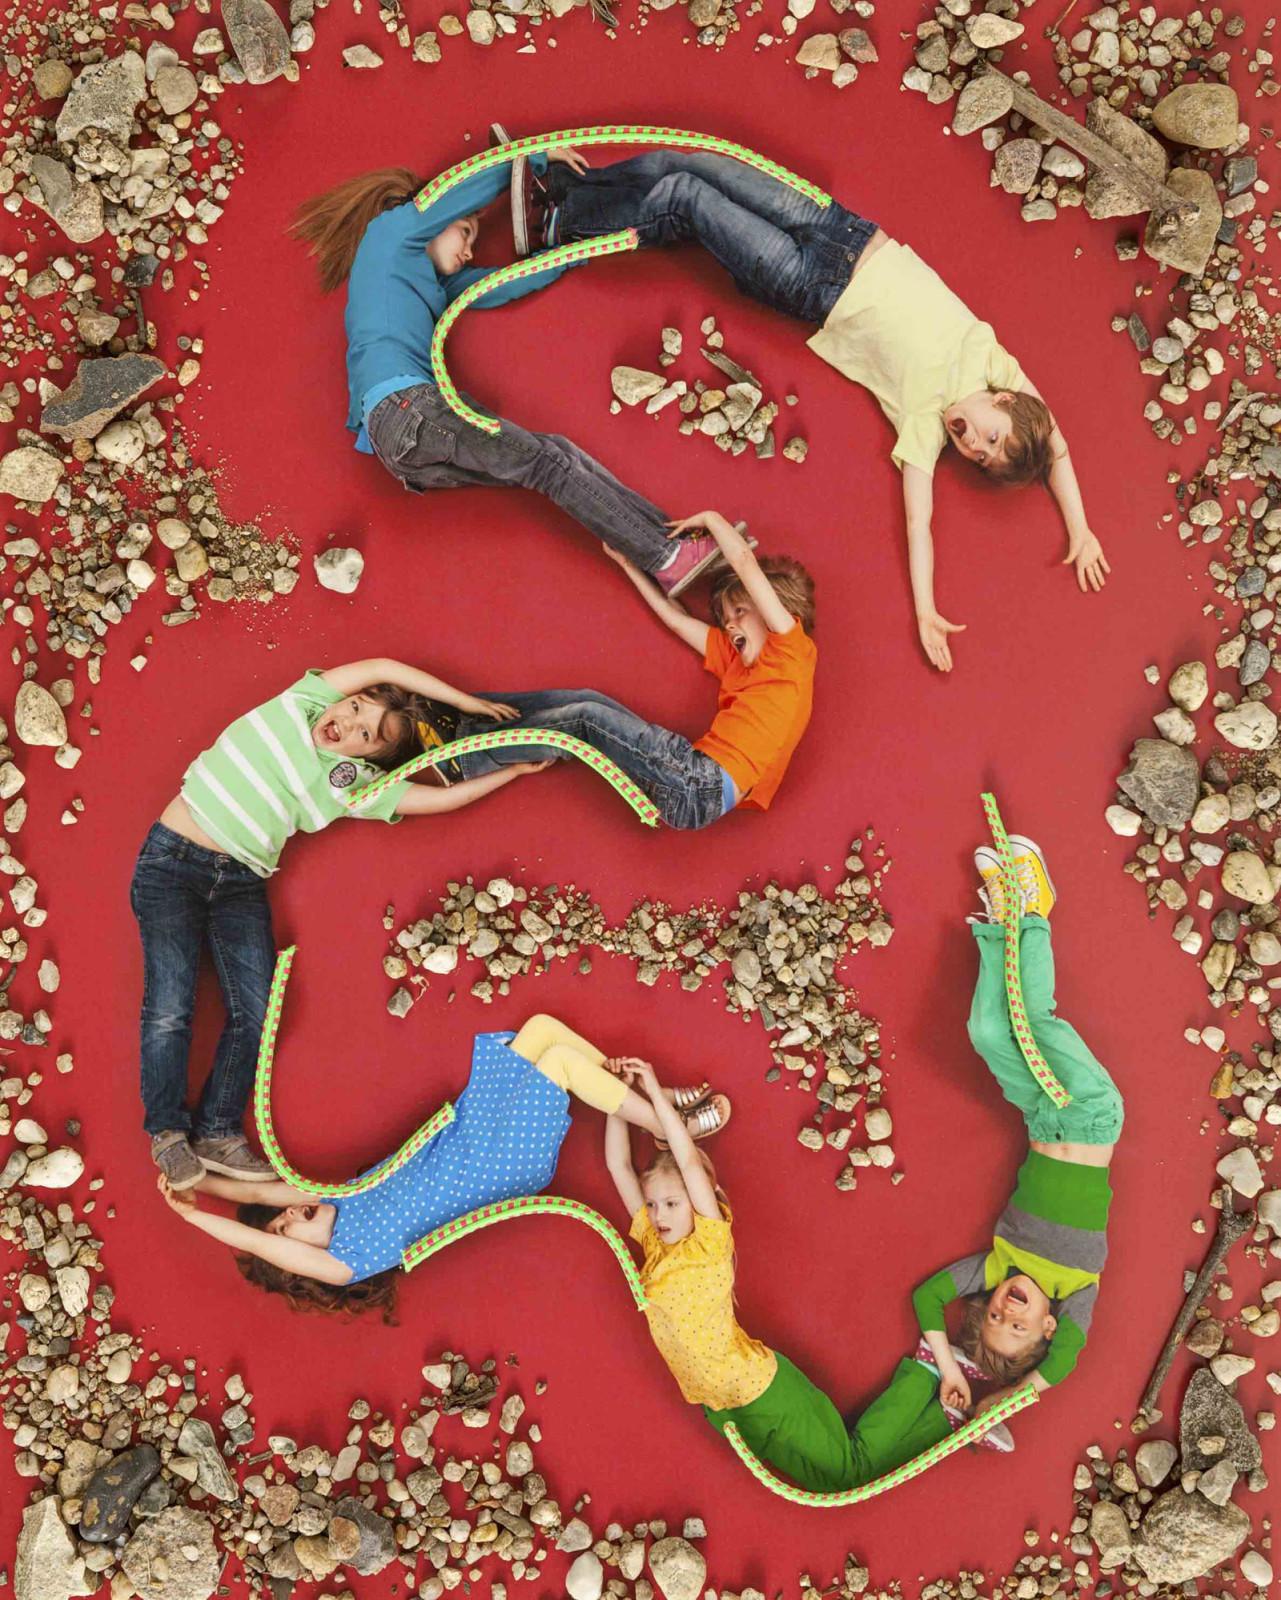 La-danza-del-serpente-1281x1600